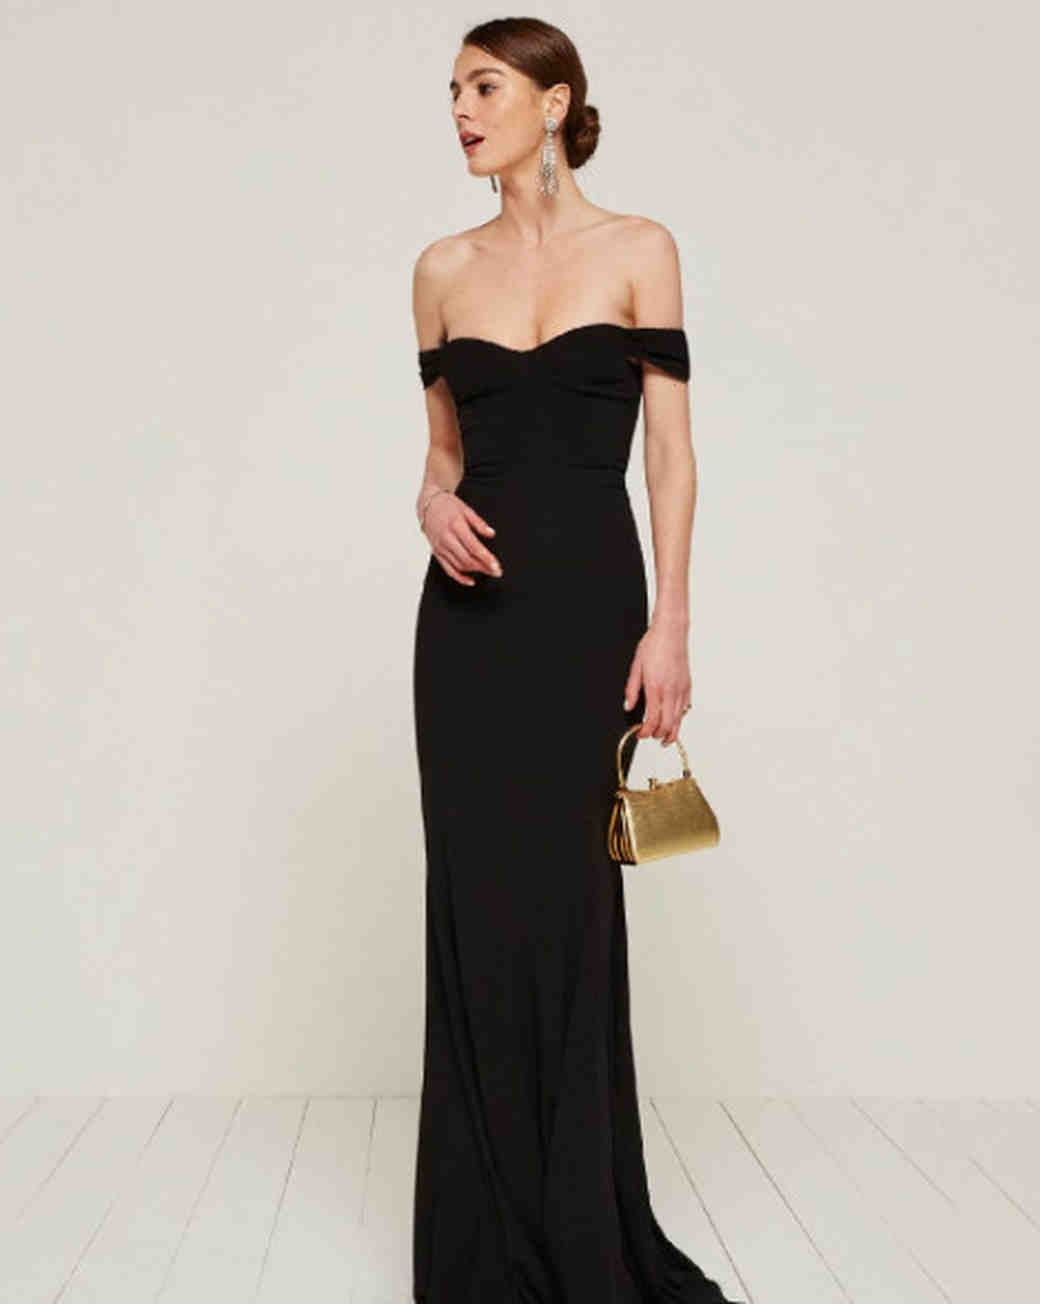 36 Beautiful Dresses To Wear As A Wedding Guest This Fall | Martha Stewart  Weddings